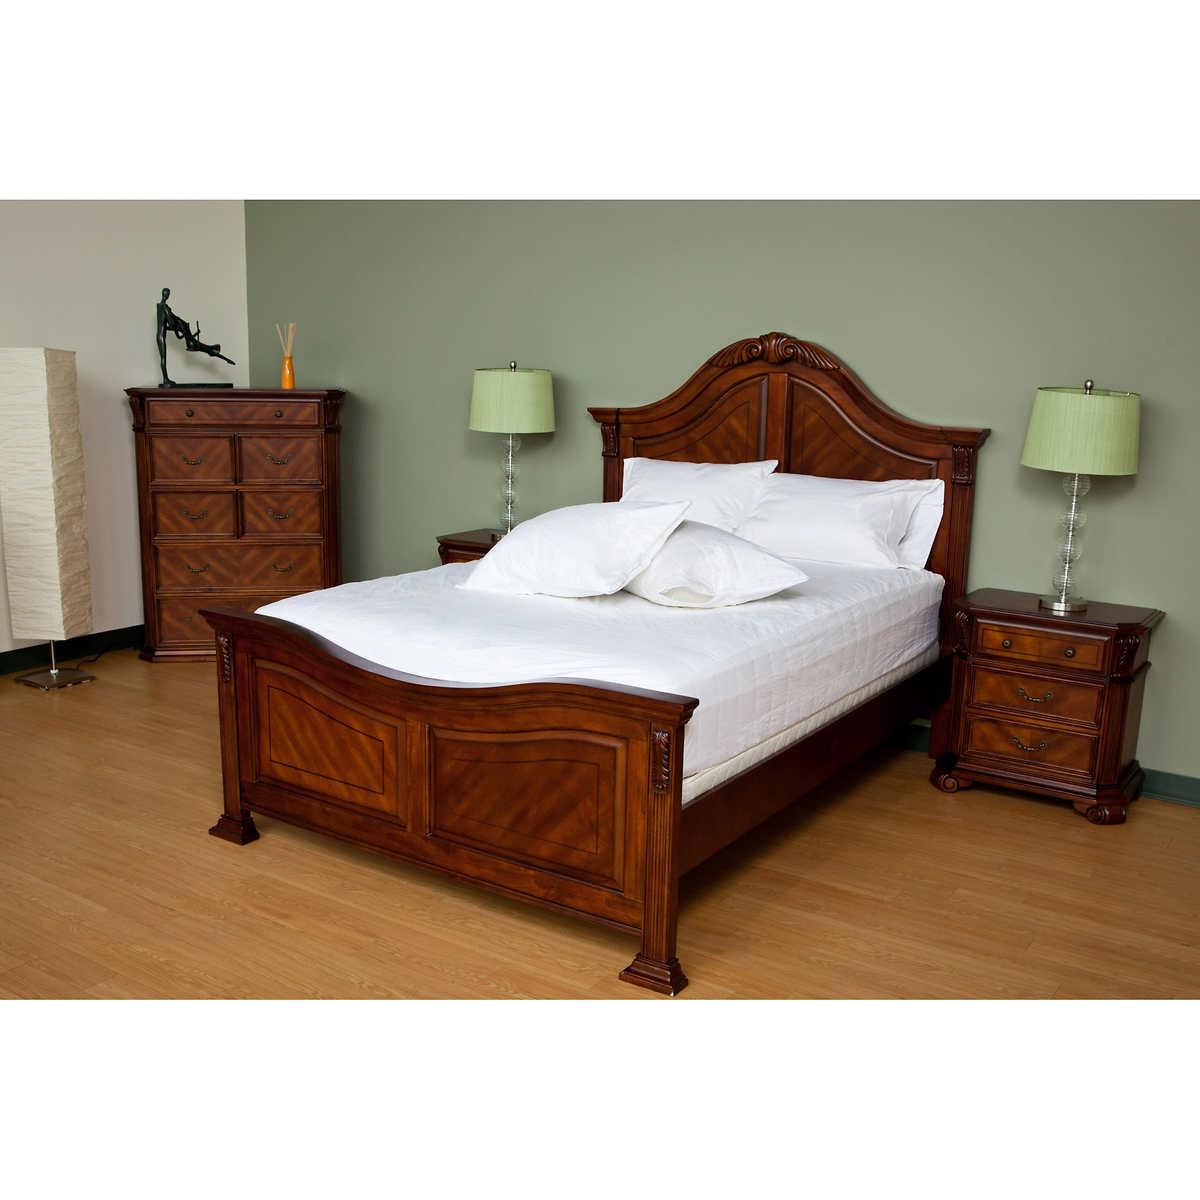 mattress pads toppers costco smartsilk mattress pad pillow protector set